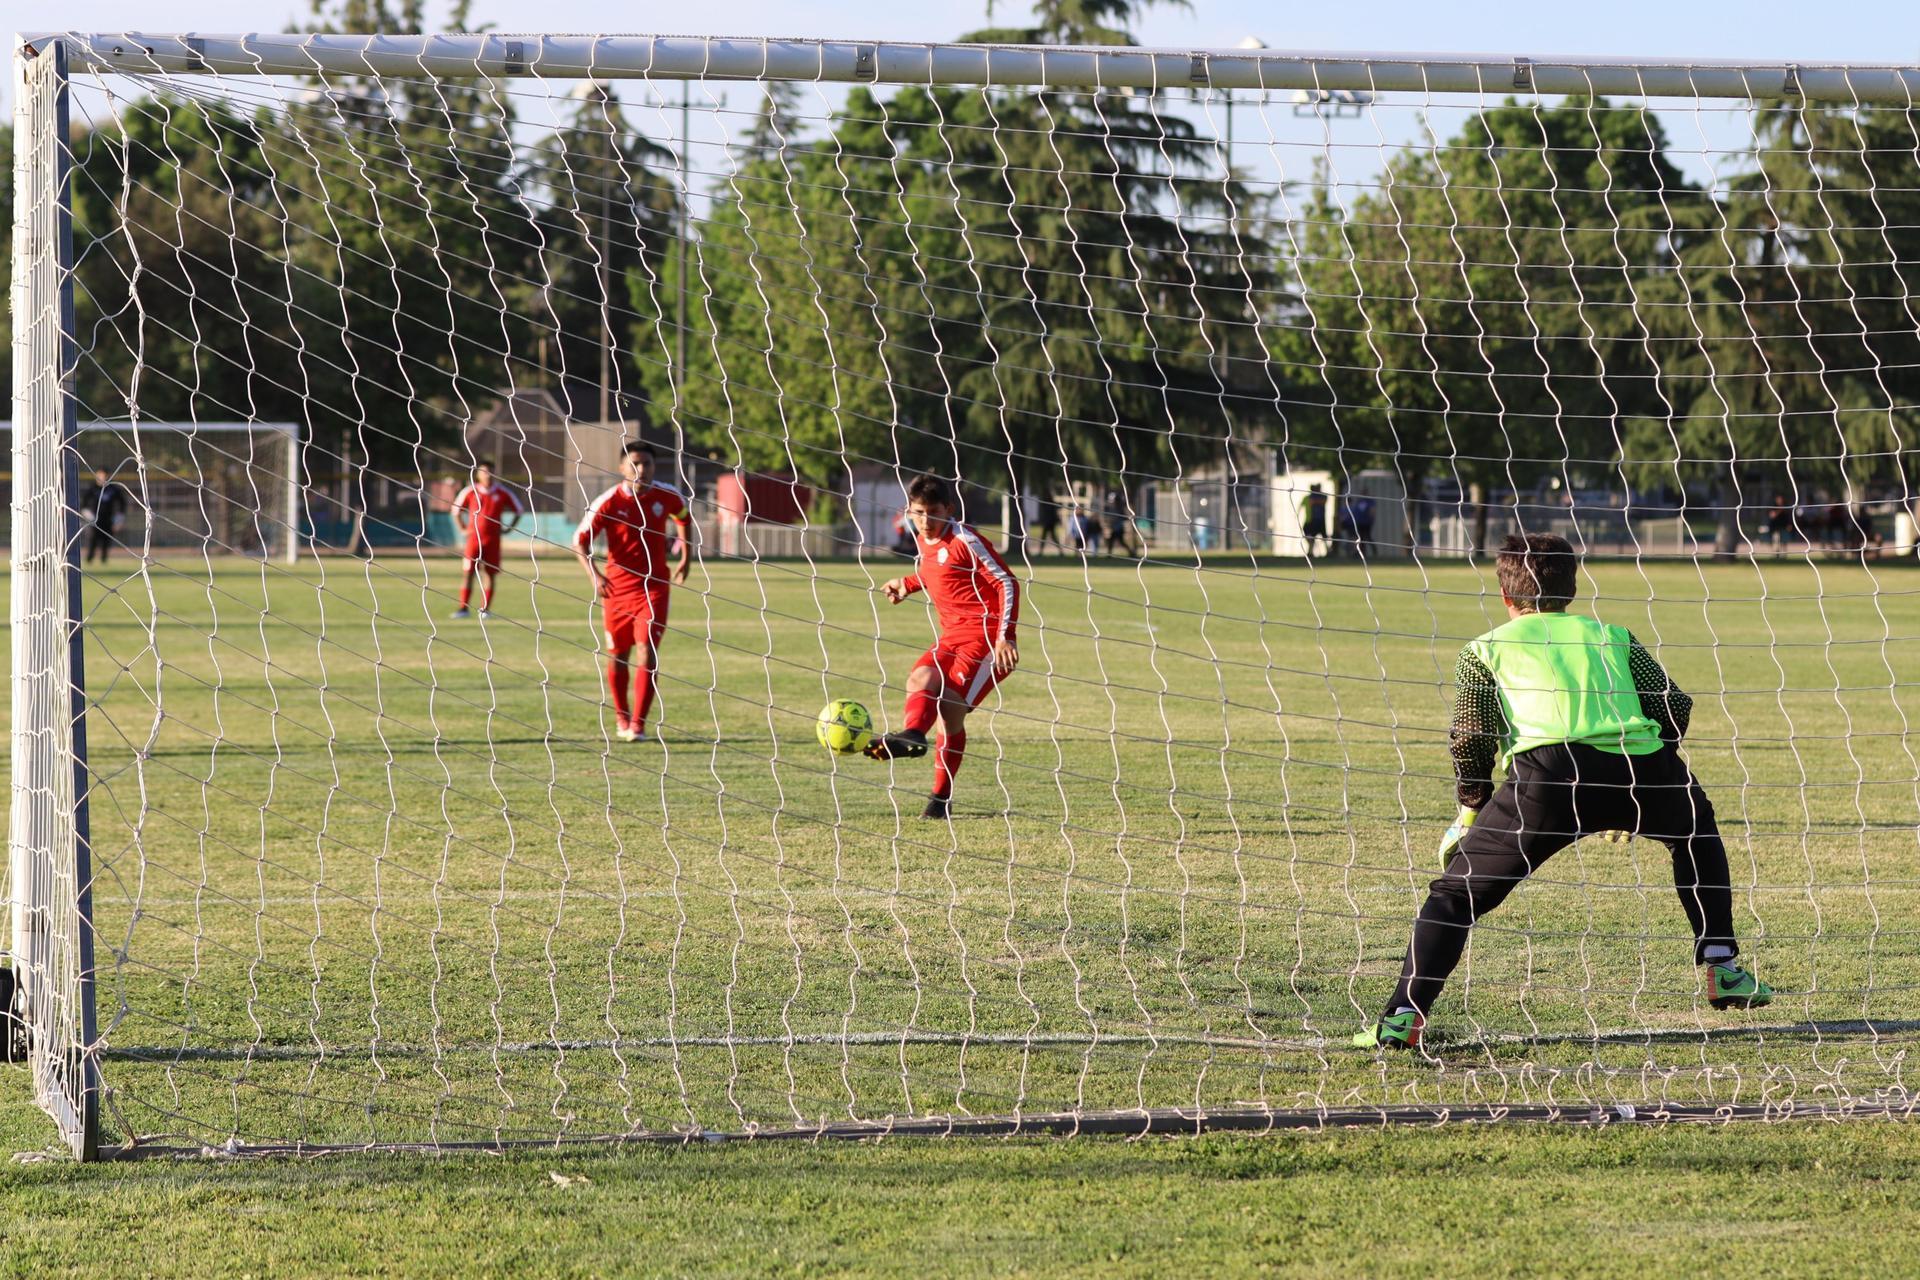 boys playing soccer against Yosemite